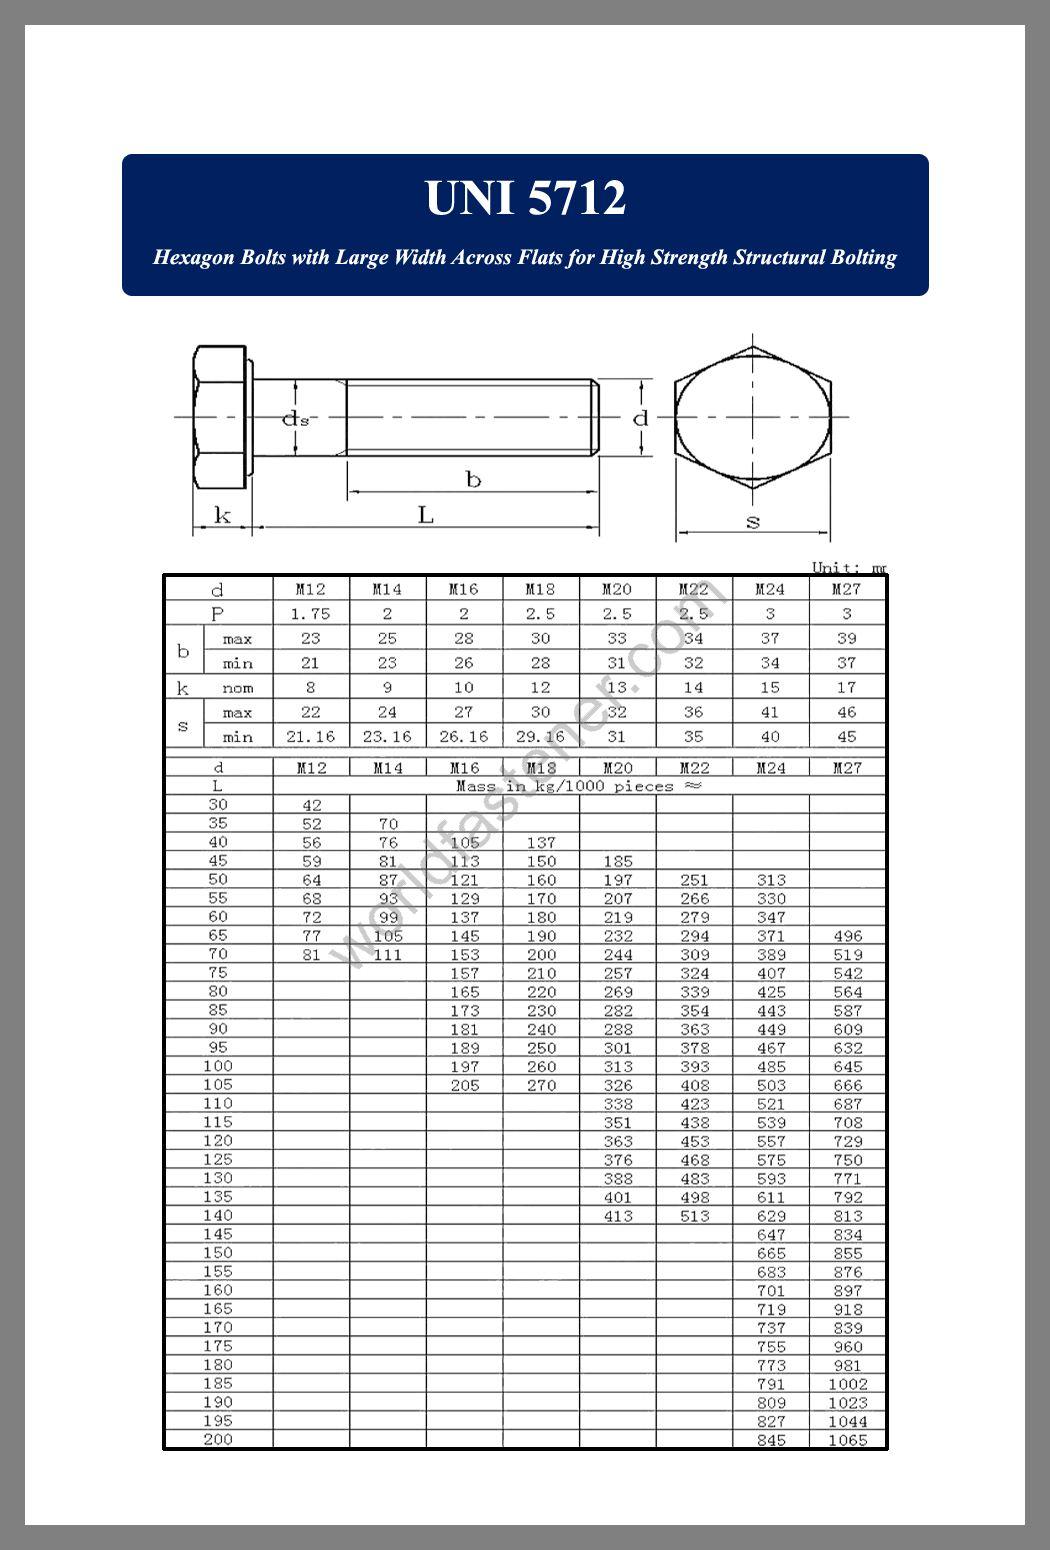 UNI 5712, UNI 5712 Strength Structural Bolting, fastener, screw, bolt, UNI Bolt